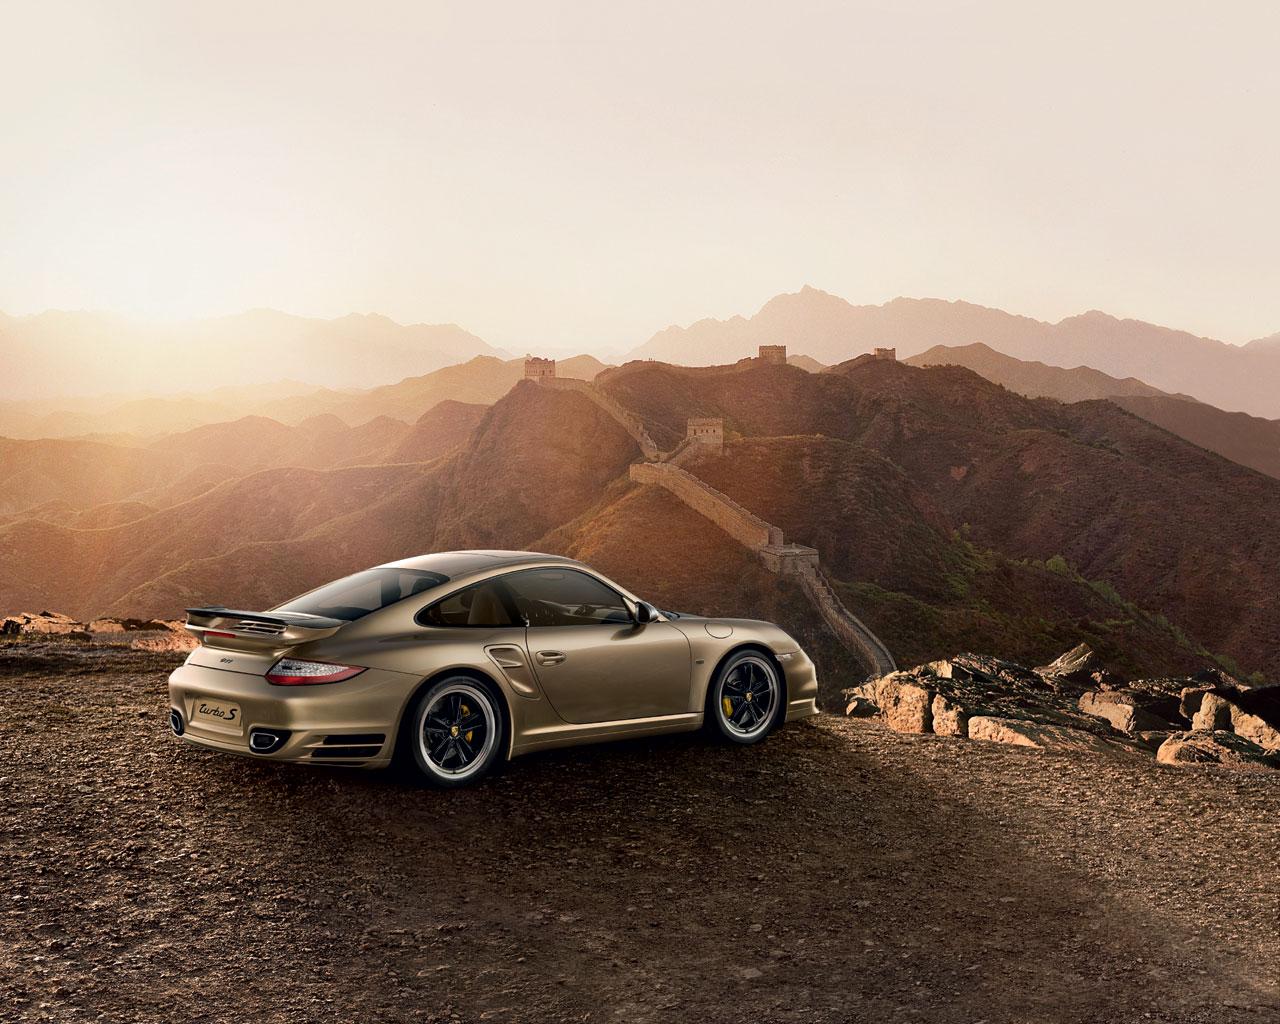 Porsche 911 Turbo S China 10th Anniversary Limited Edition